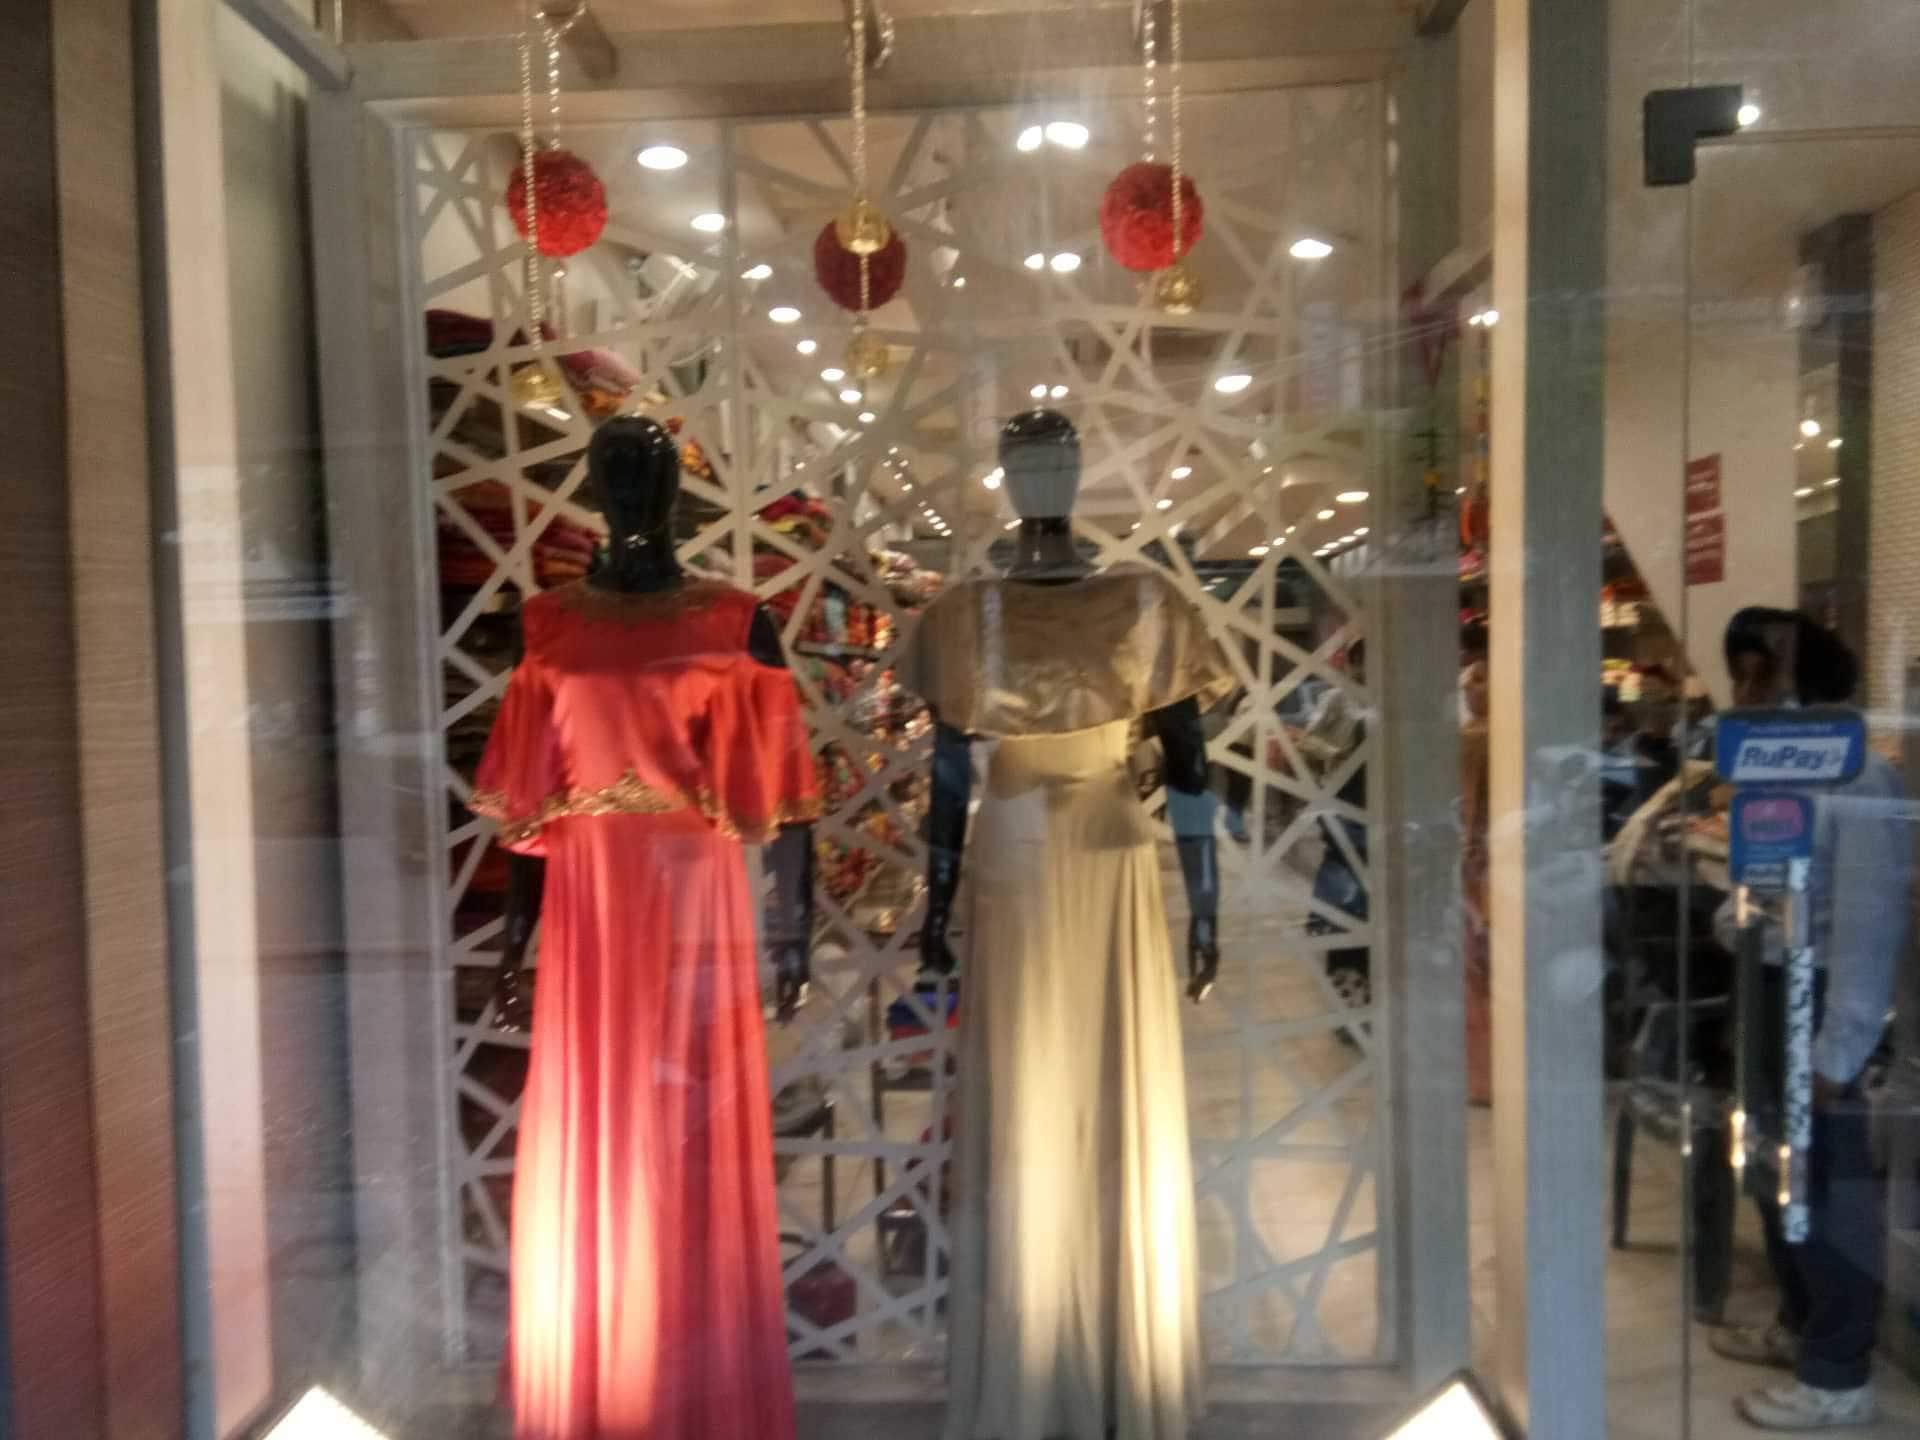 cdbe36f006 Top Ladies Readymade Garment Retailers in Pathankot - Best Women ...